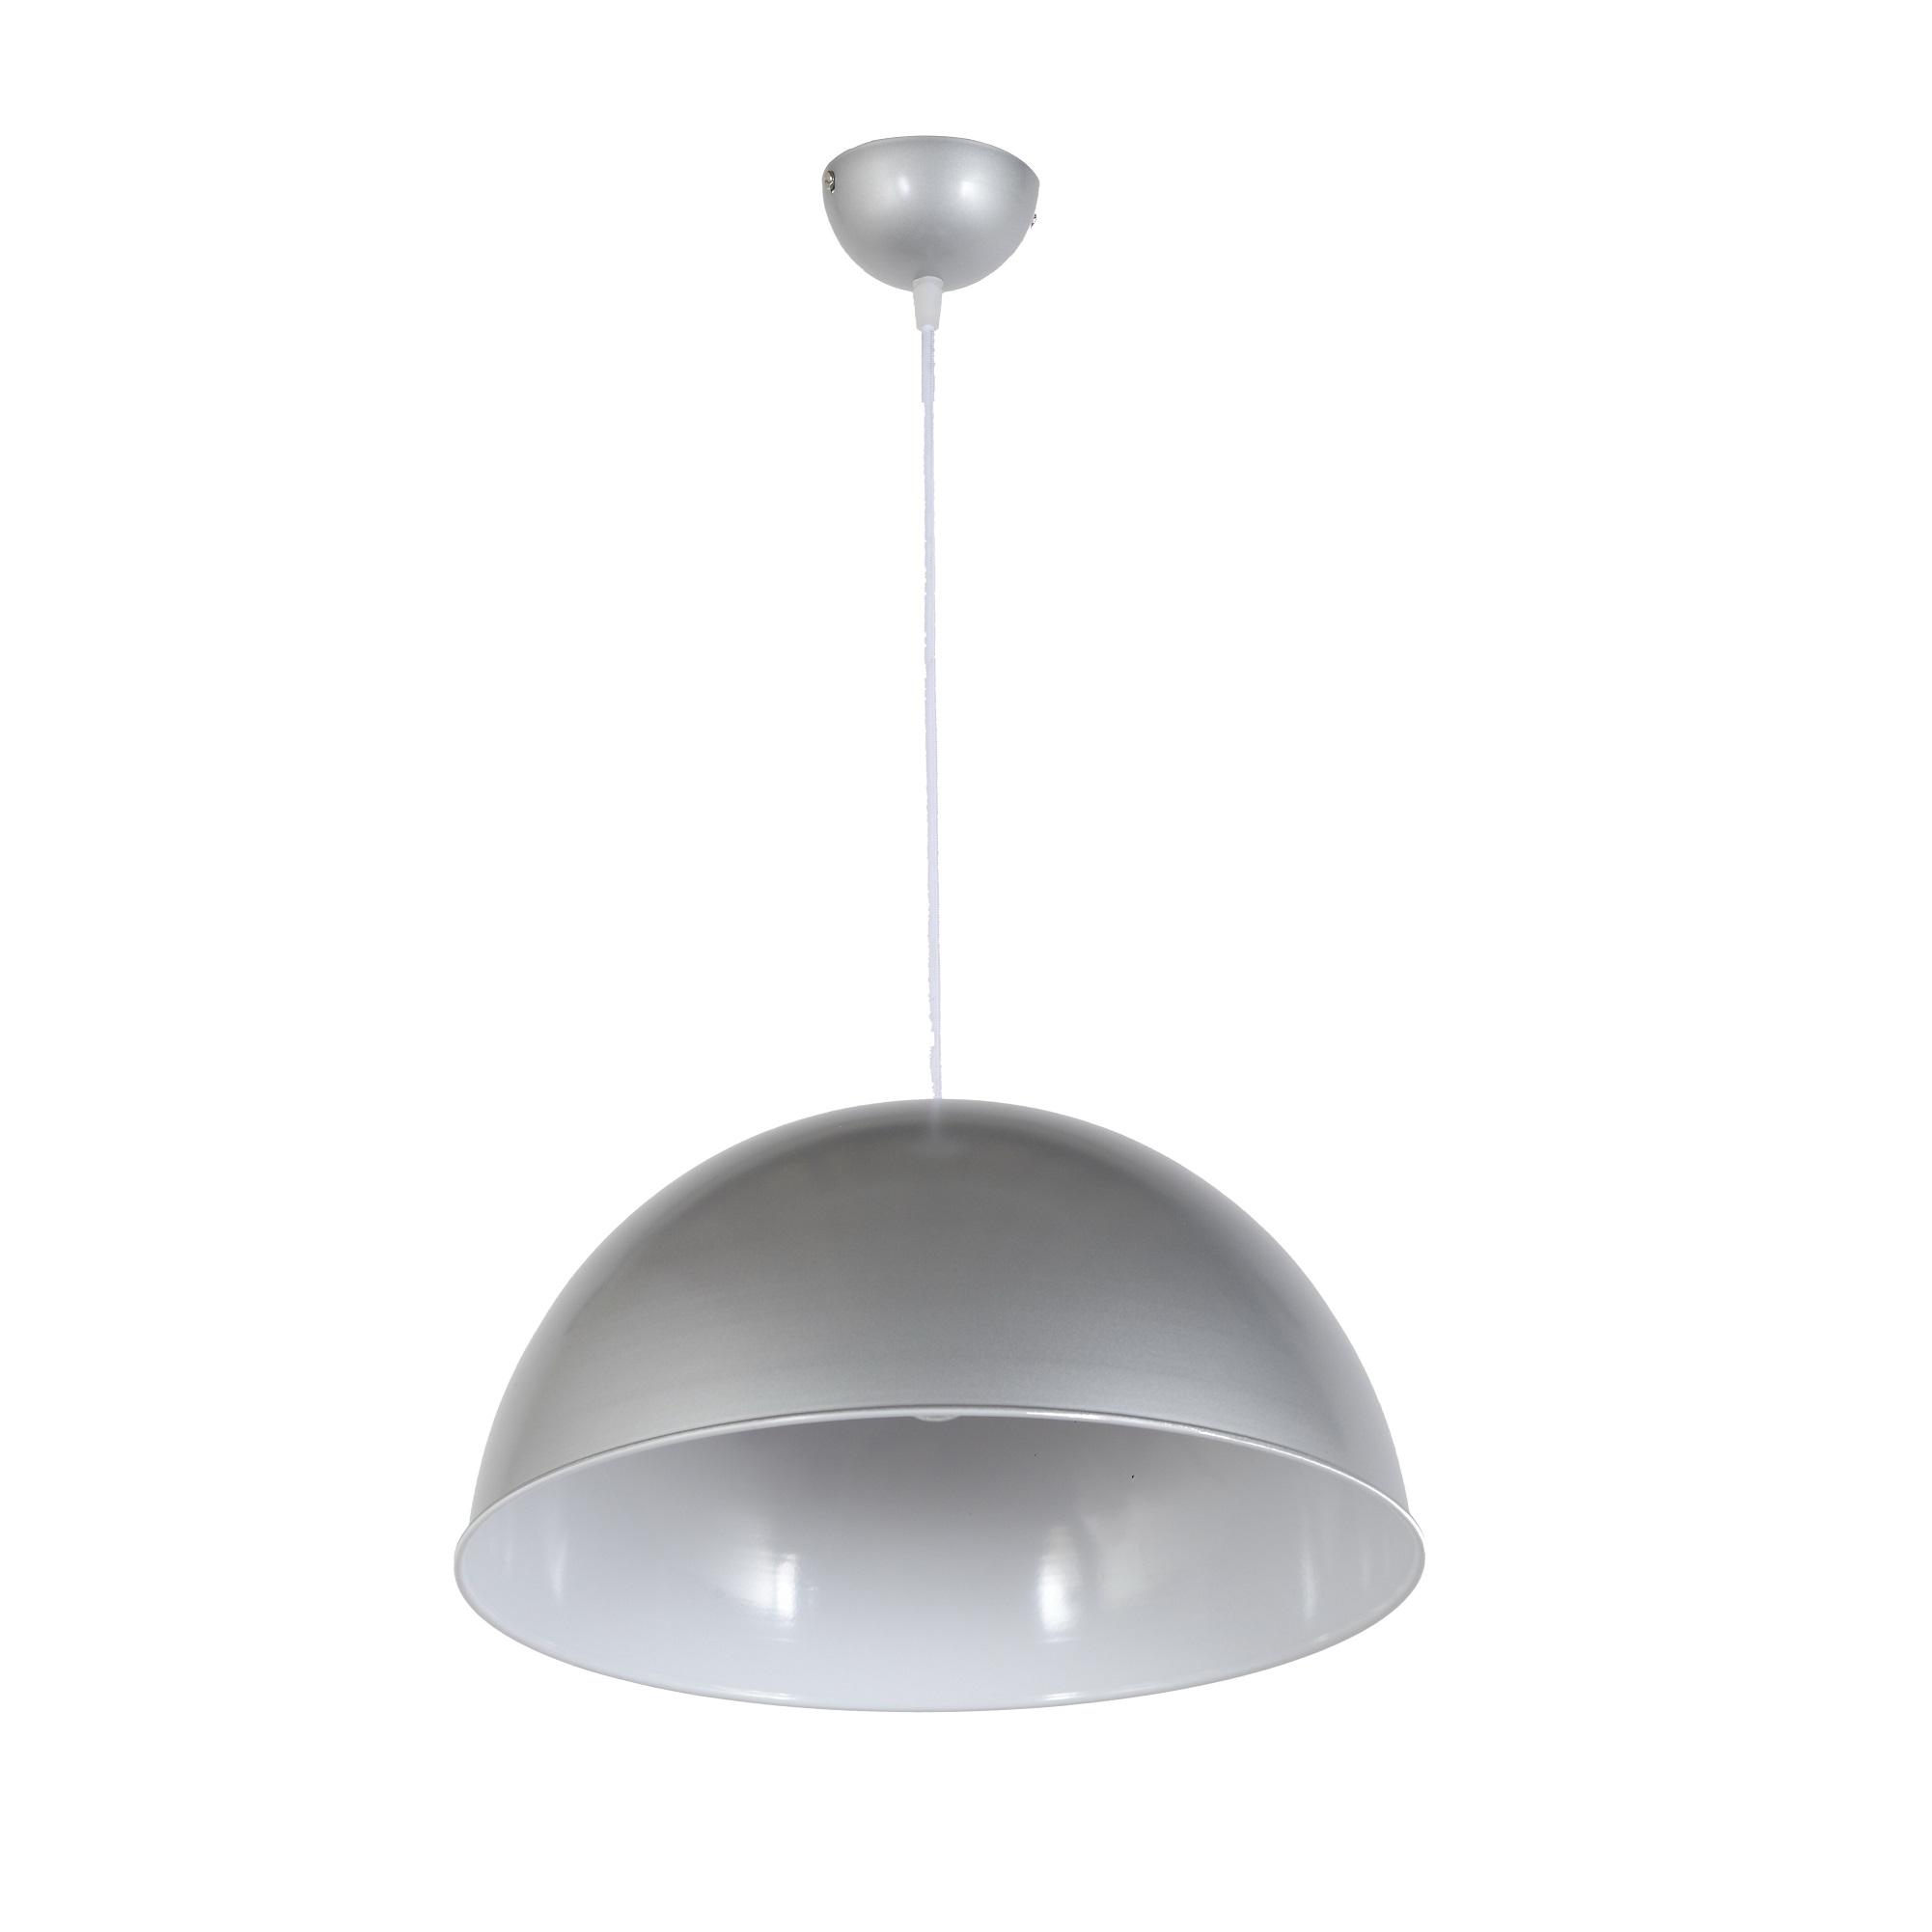 Фото - Подвесной светильник Arti Lampadari Massimo E 1.3.P1 S подвесной светильник arti lampadari olio e 1 3 p1 br